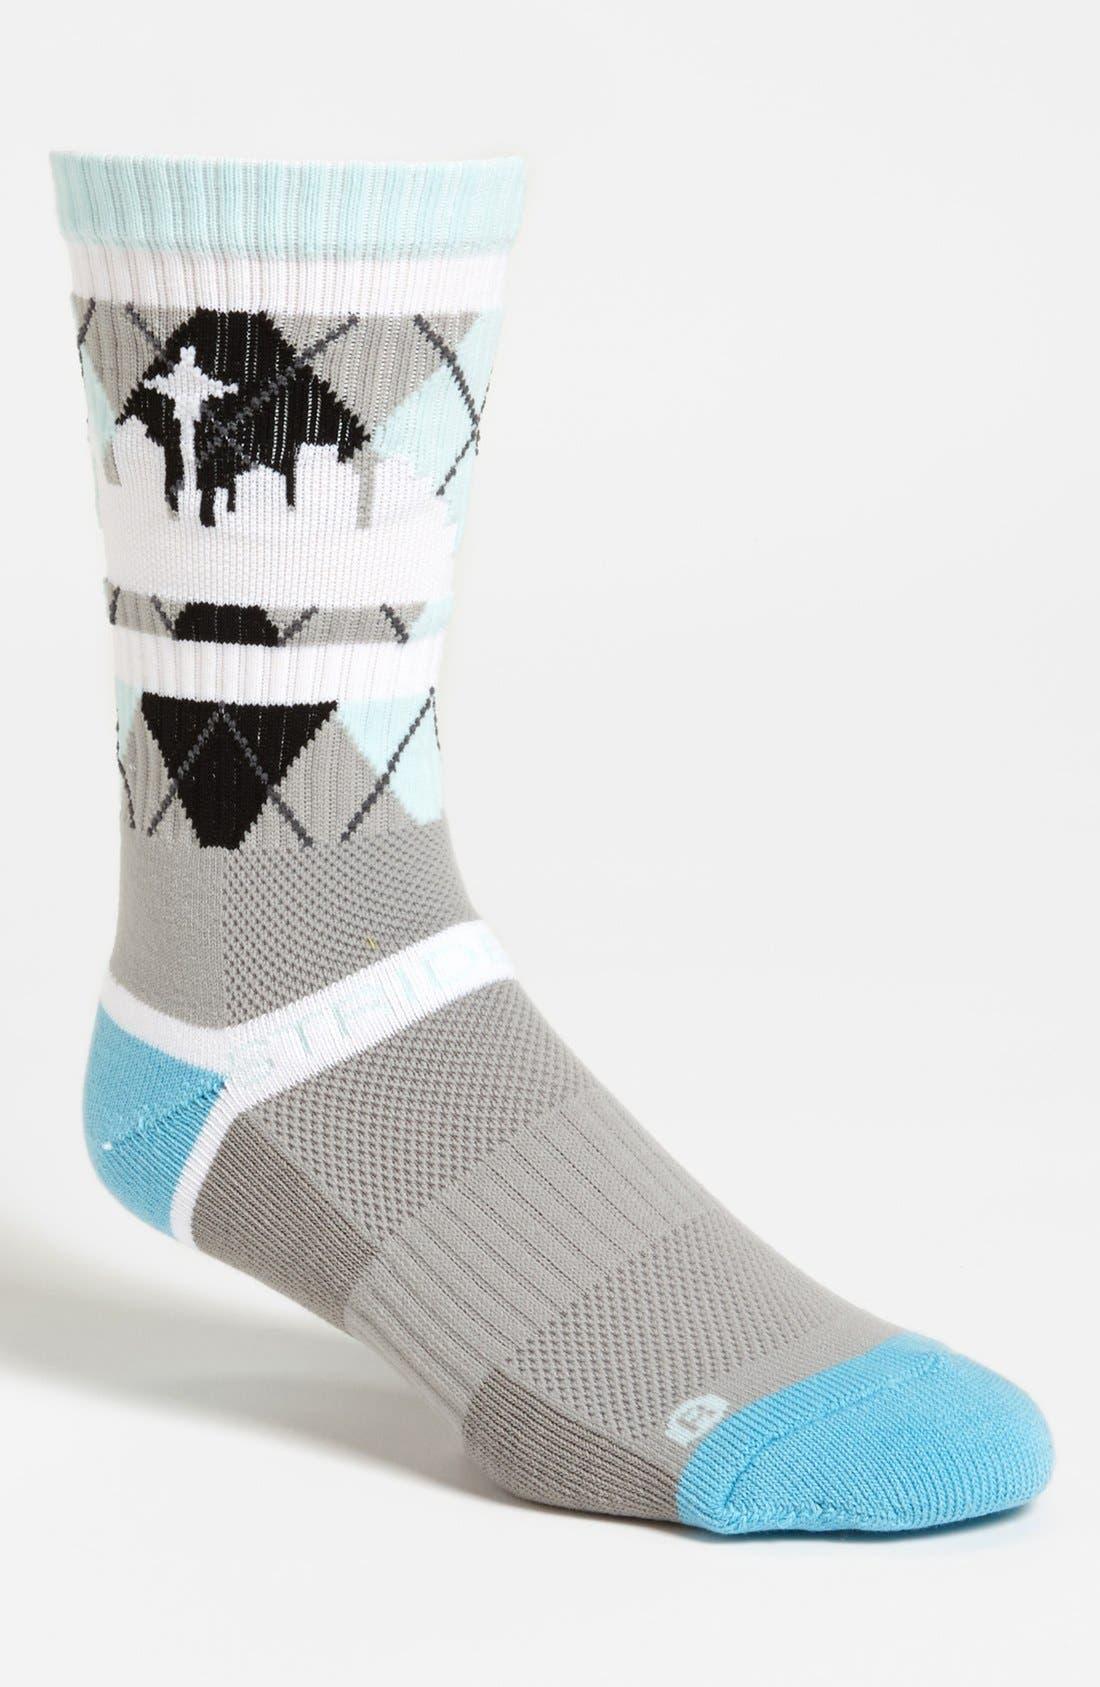 Alternate Image 1 Selected - STRIDELINE 'Seattle' Socks